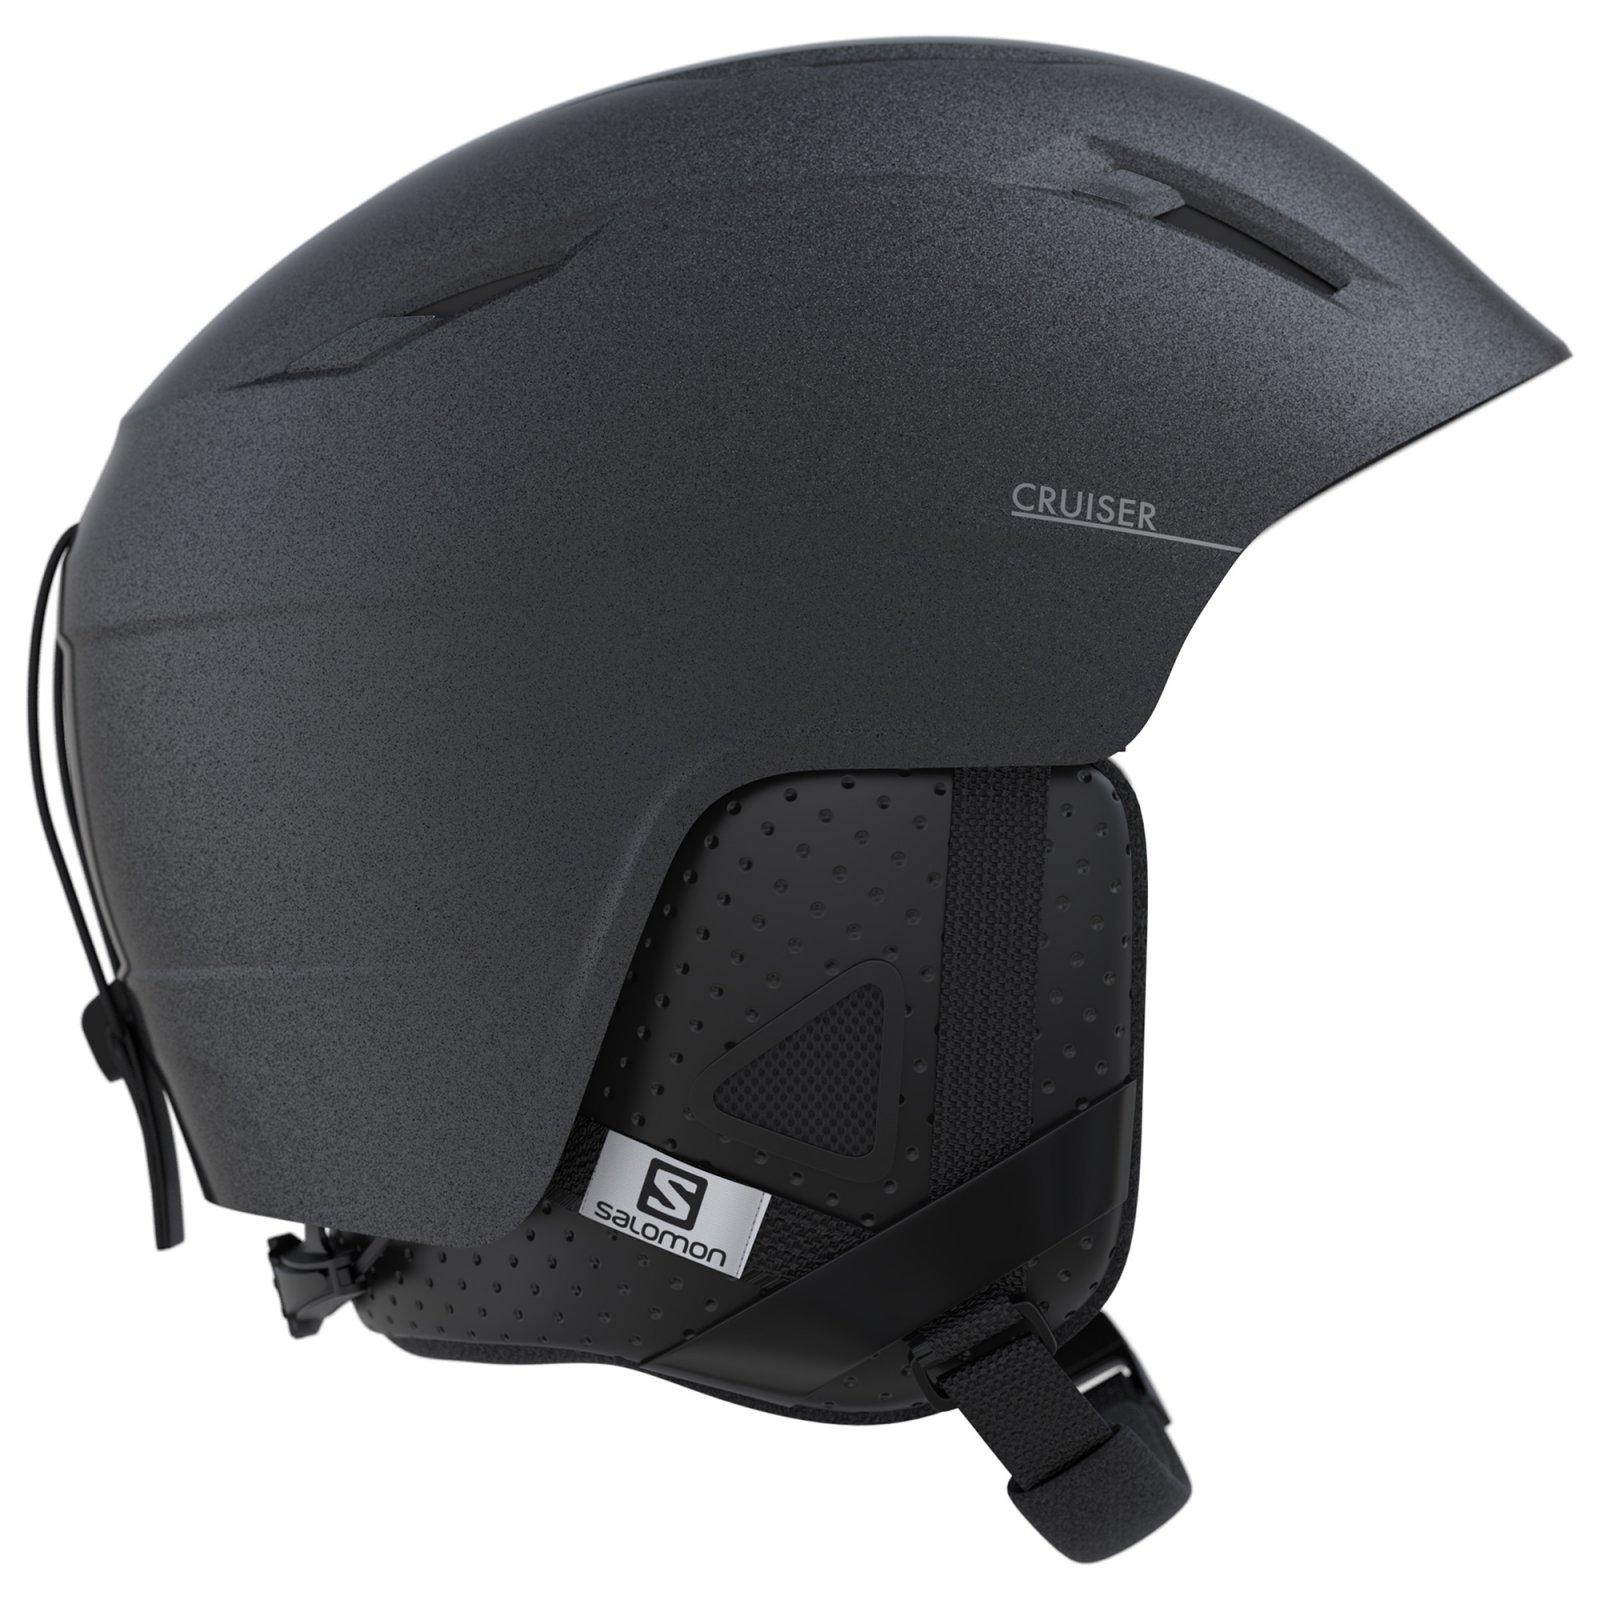 2018/19 Salomon Cruiser Helmet